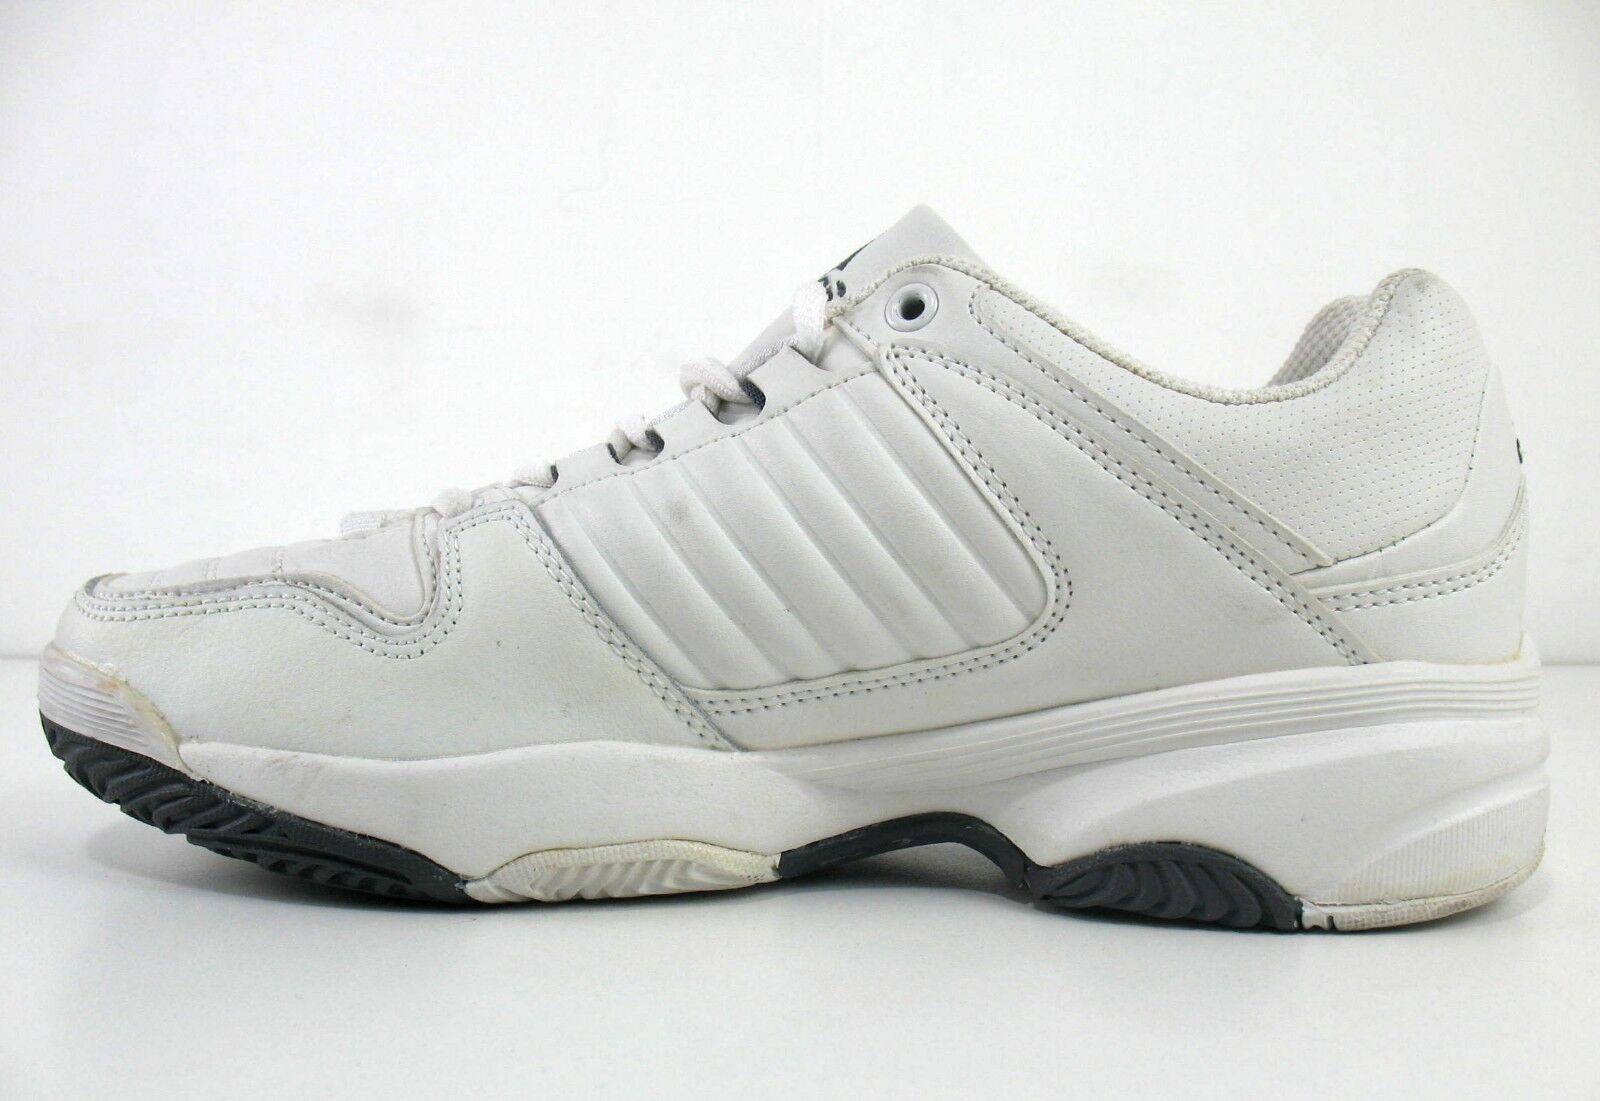 les baskets adidas adidas adidas  blanc de chaussures  kt échantillon  femme taille 8,5 | Stocker  2e00c0